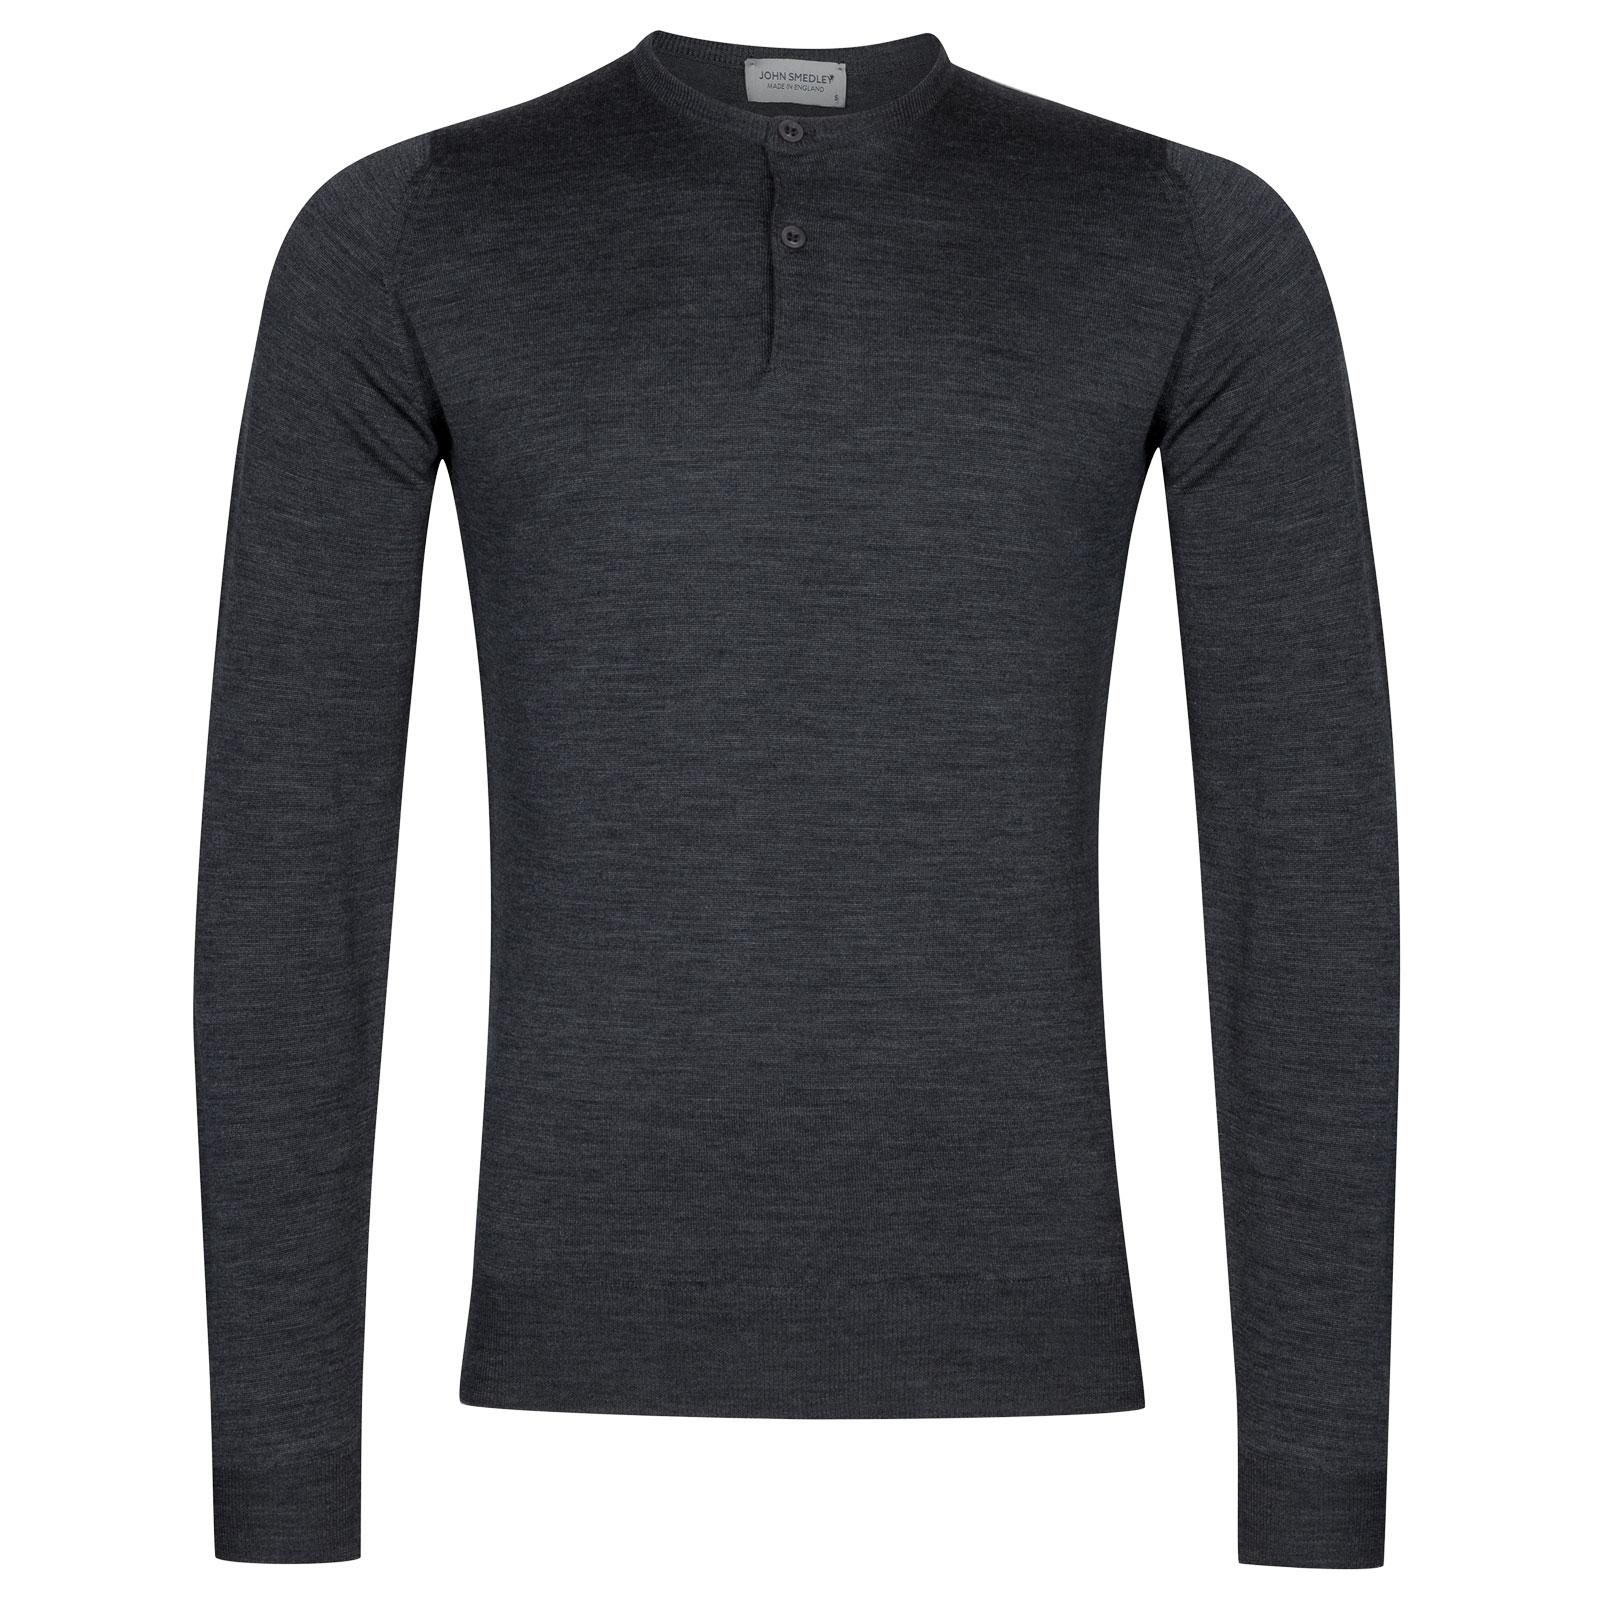 John Smedley Russet Merino Wool Henley Shirt in Charcoal-XL